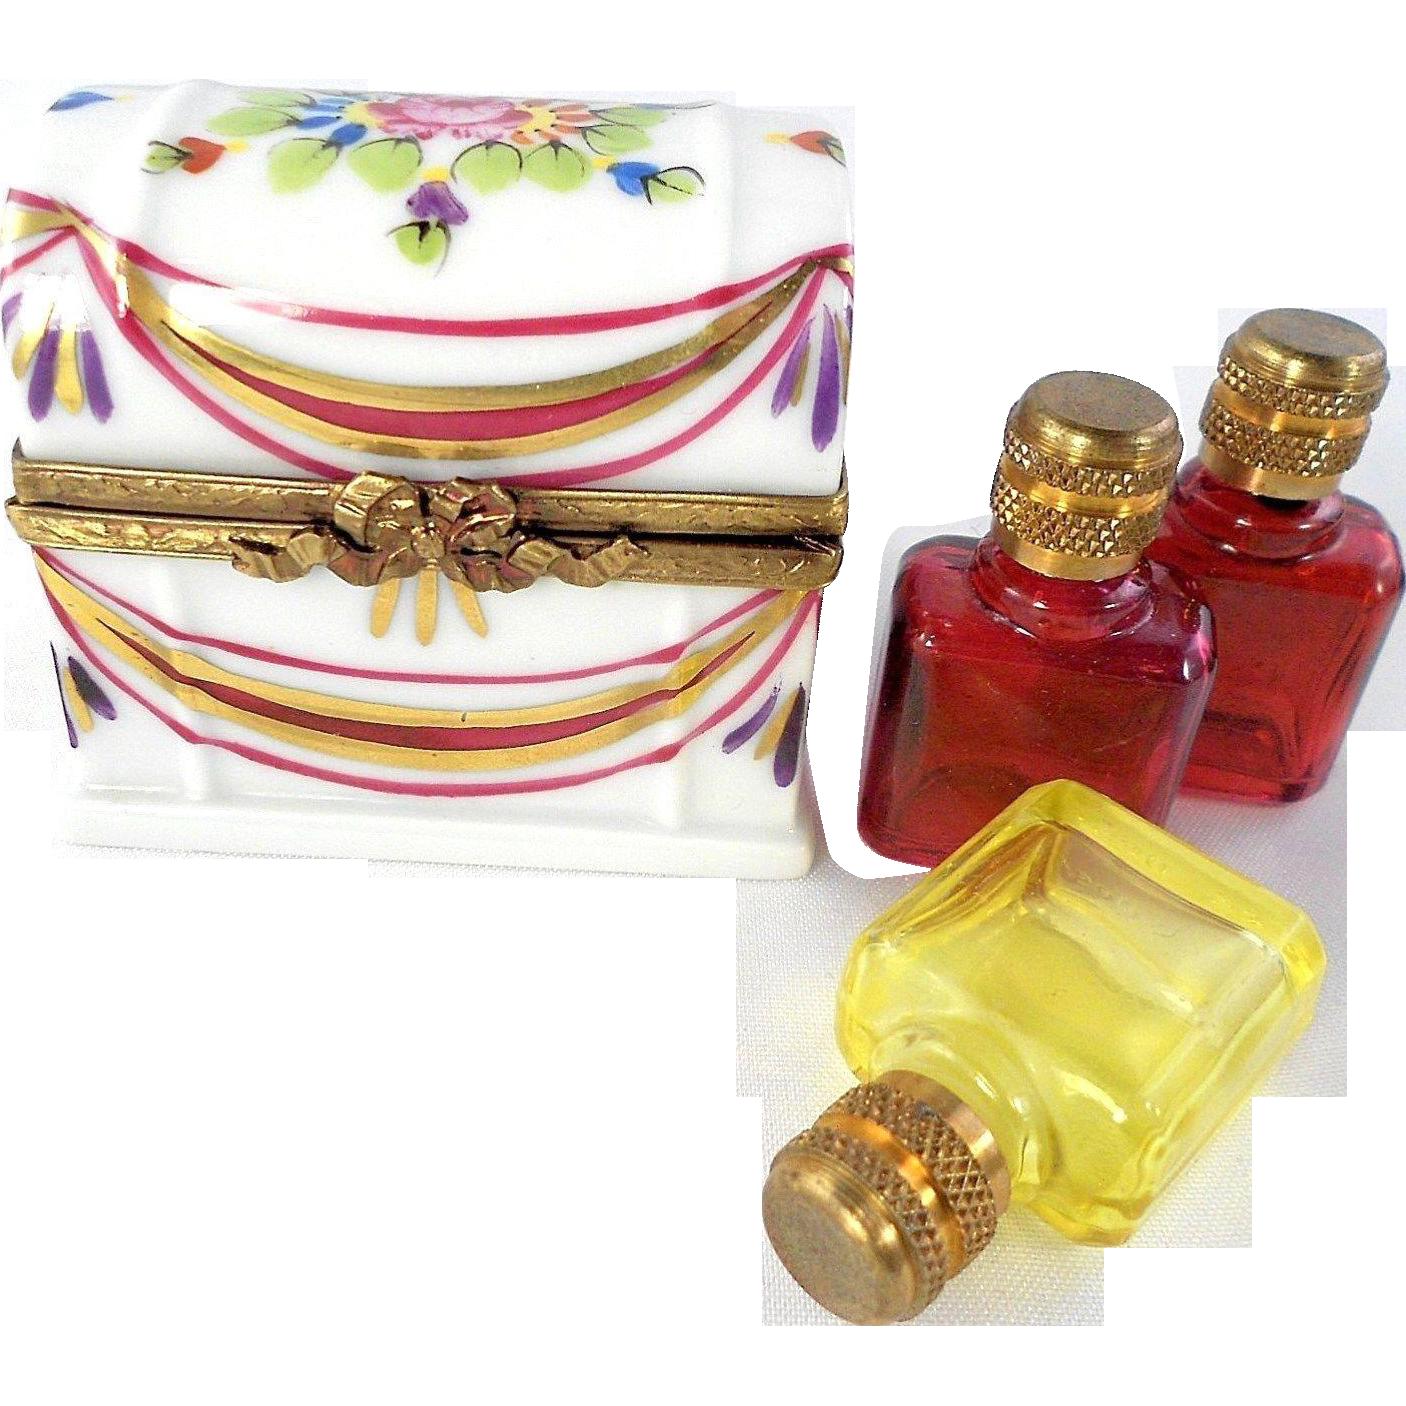 45% OFF Rare Magenta/Yellow Triple Perfume Bottle Hand Painted Limoges Trinket Box